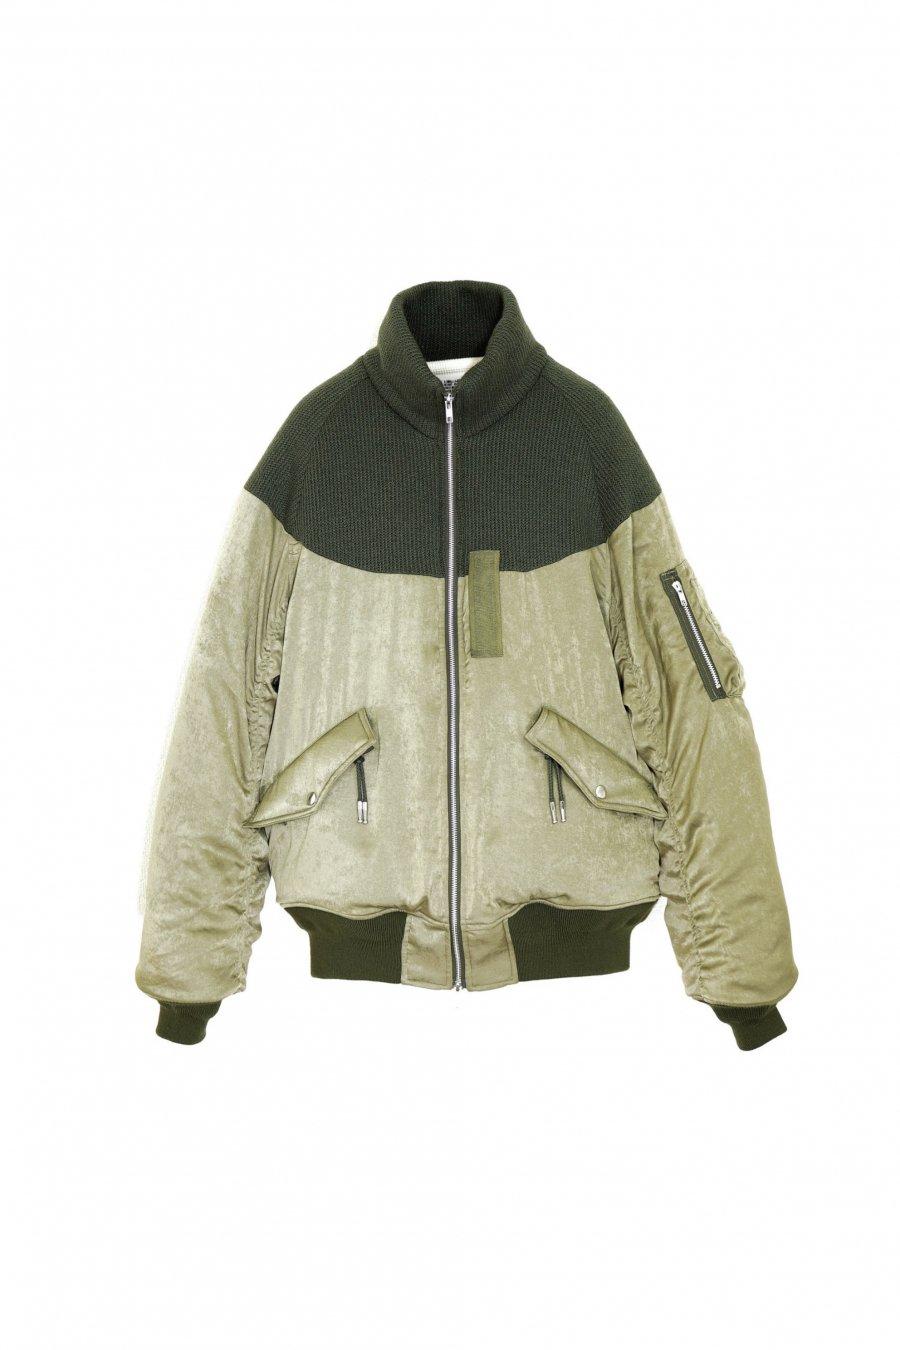 elephant TRIBAL fabrics  Hybrid Bomber JKT<img class='new_mark_img2' src='https://img.shop-pro.jp/img/new/icons15.gif' style='border:none;display:inline;margin:0px;padding:0px;width:auto;' />